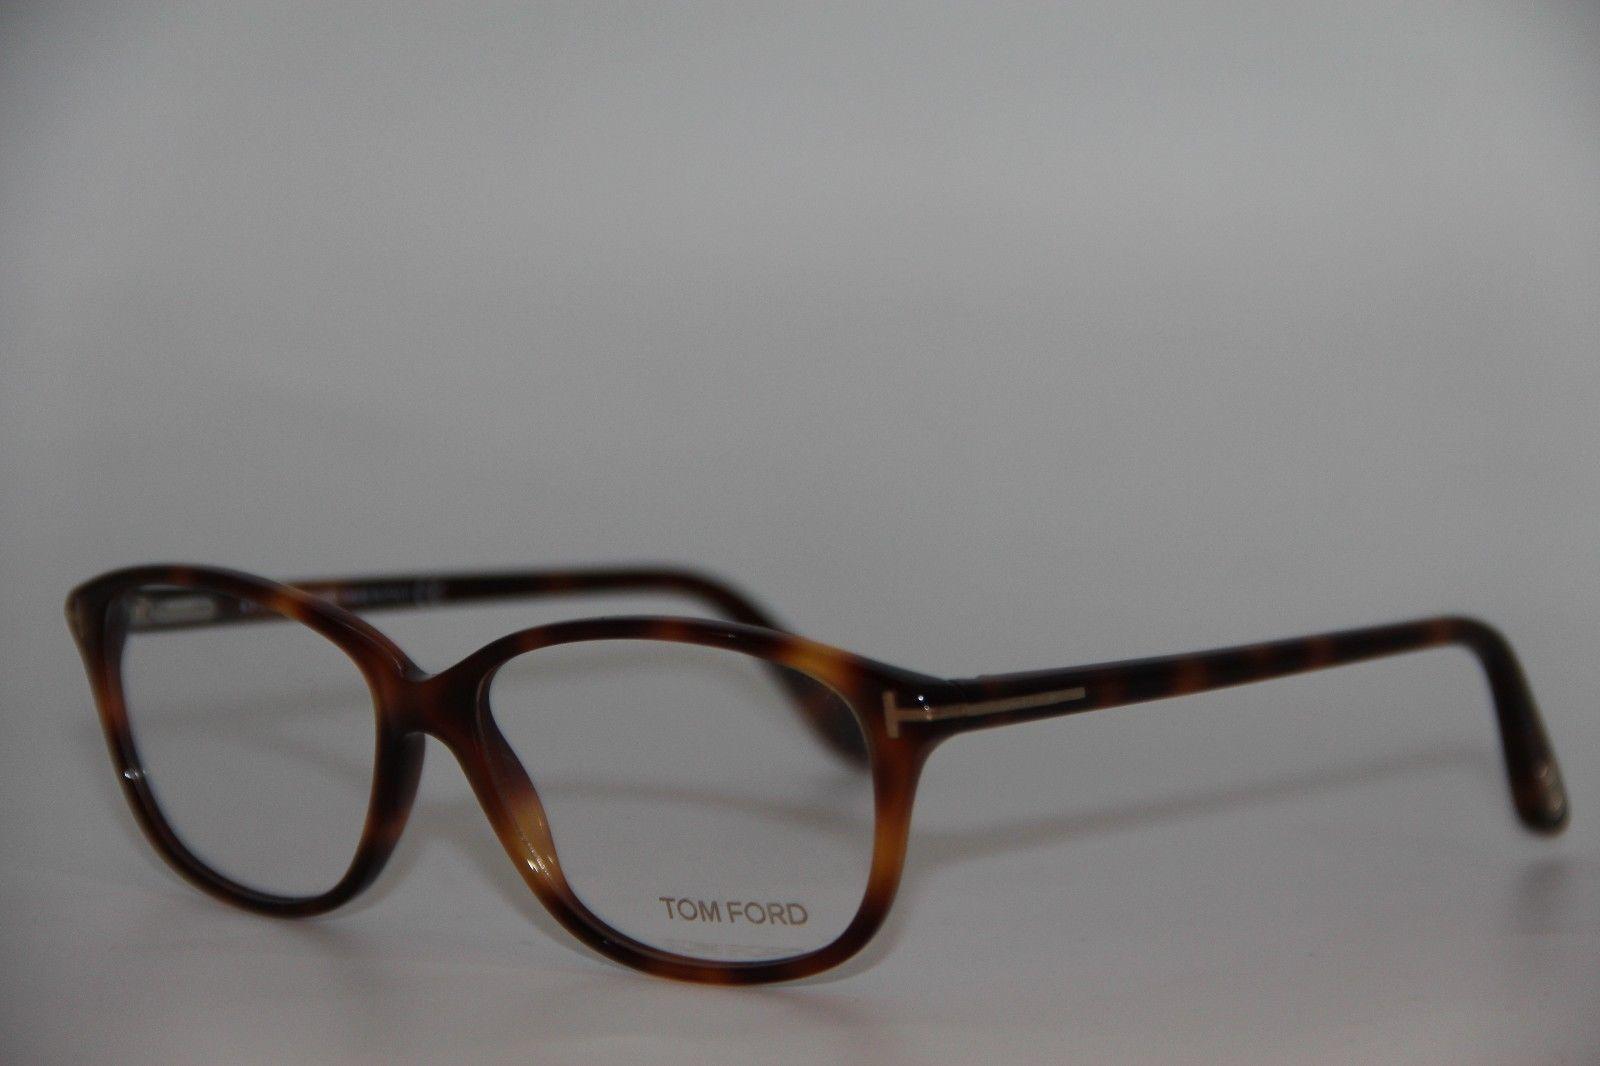 53529805c334 New Tom Ford Tf 5316 056 Havana Eyeglasses and 50 similar items. 57